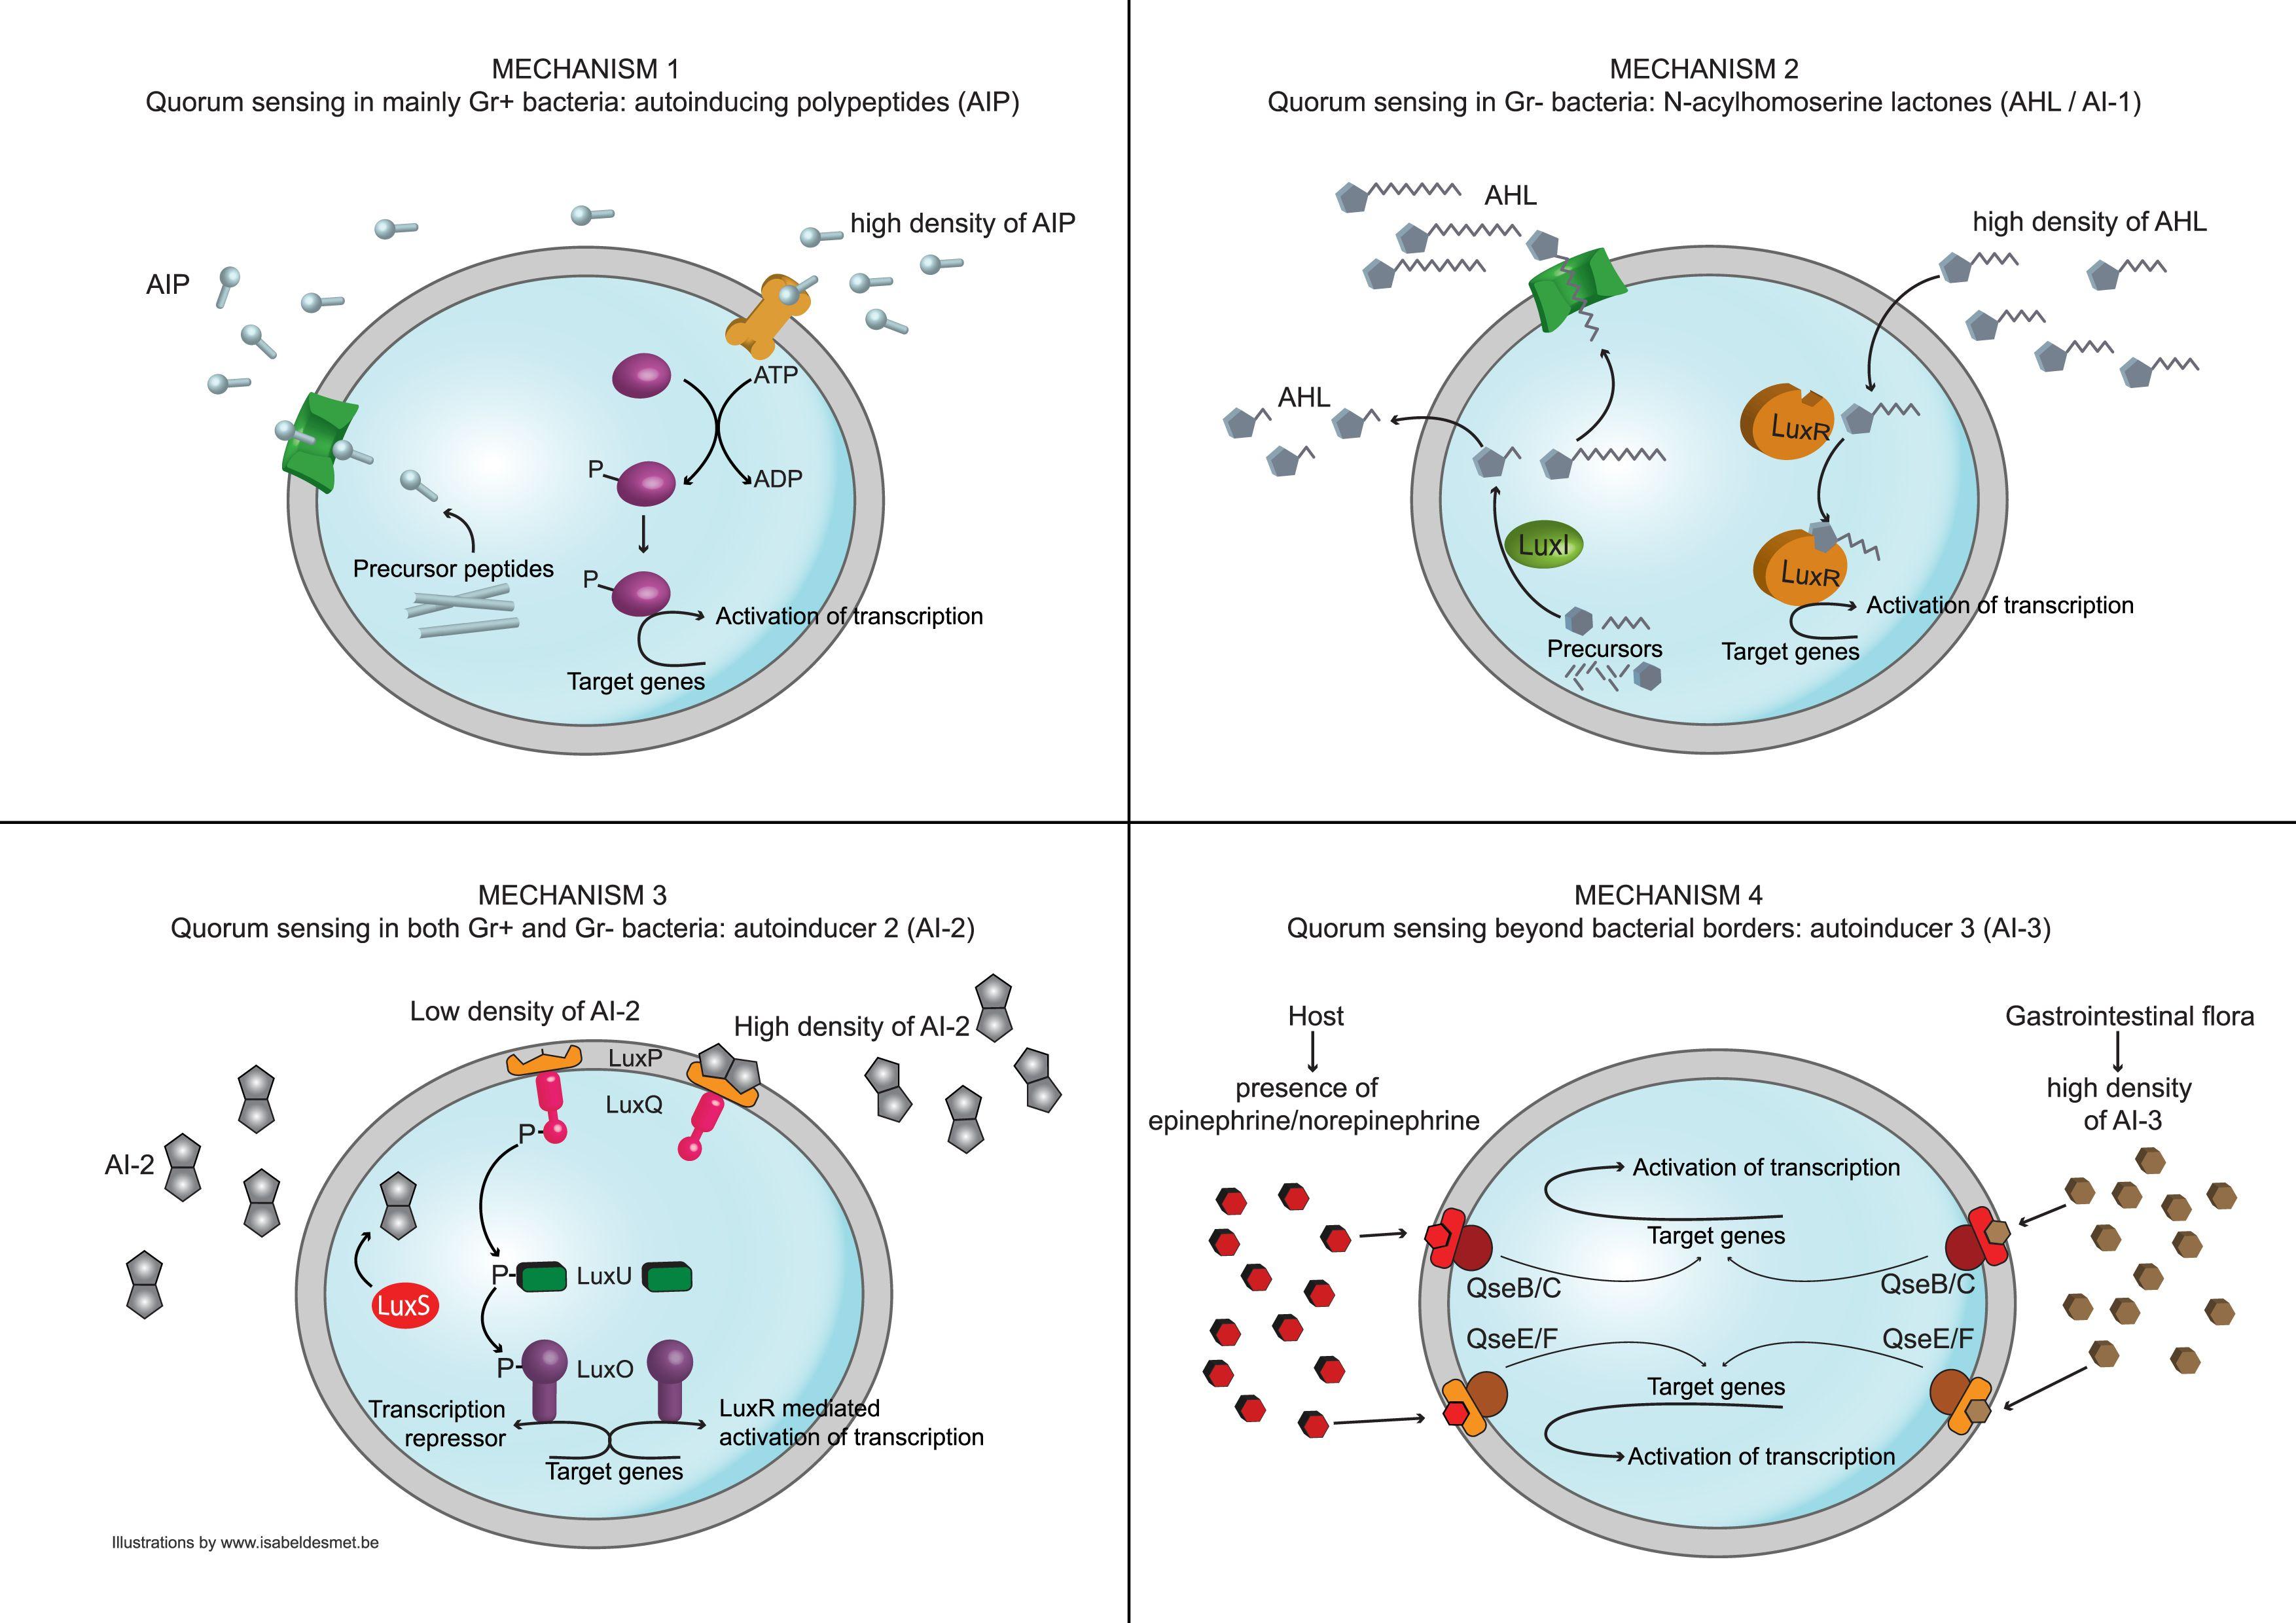 mechanisms of quorum sensing back to school pinterest molecular biology and school. Black Bedroom Furniture Sets. Home Design Ideas